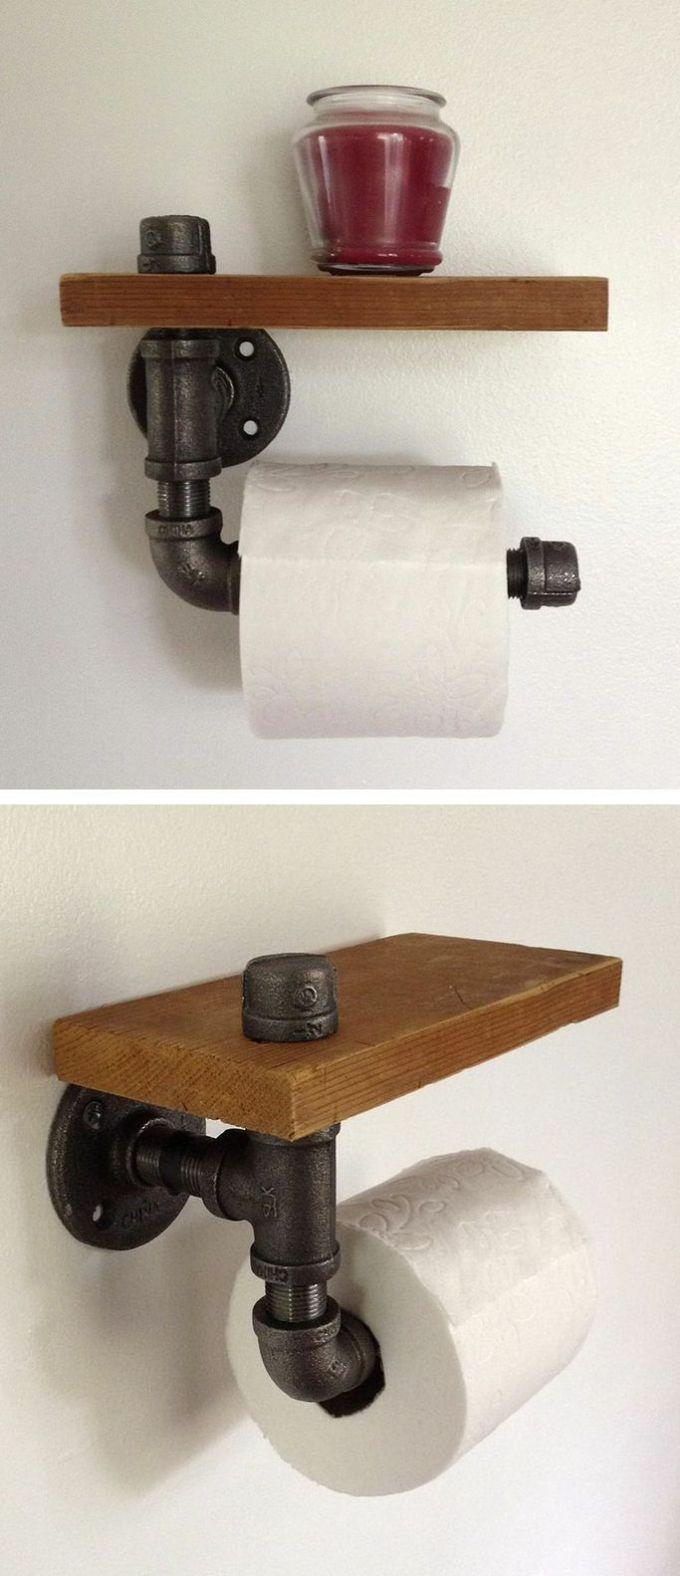 Rustic Bathroom Decor Ideas - Pipe-fitting Toilet Paper Holder with Shelf - harpmagazine.com